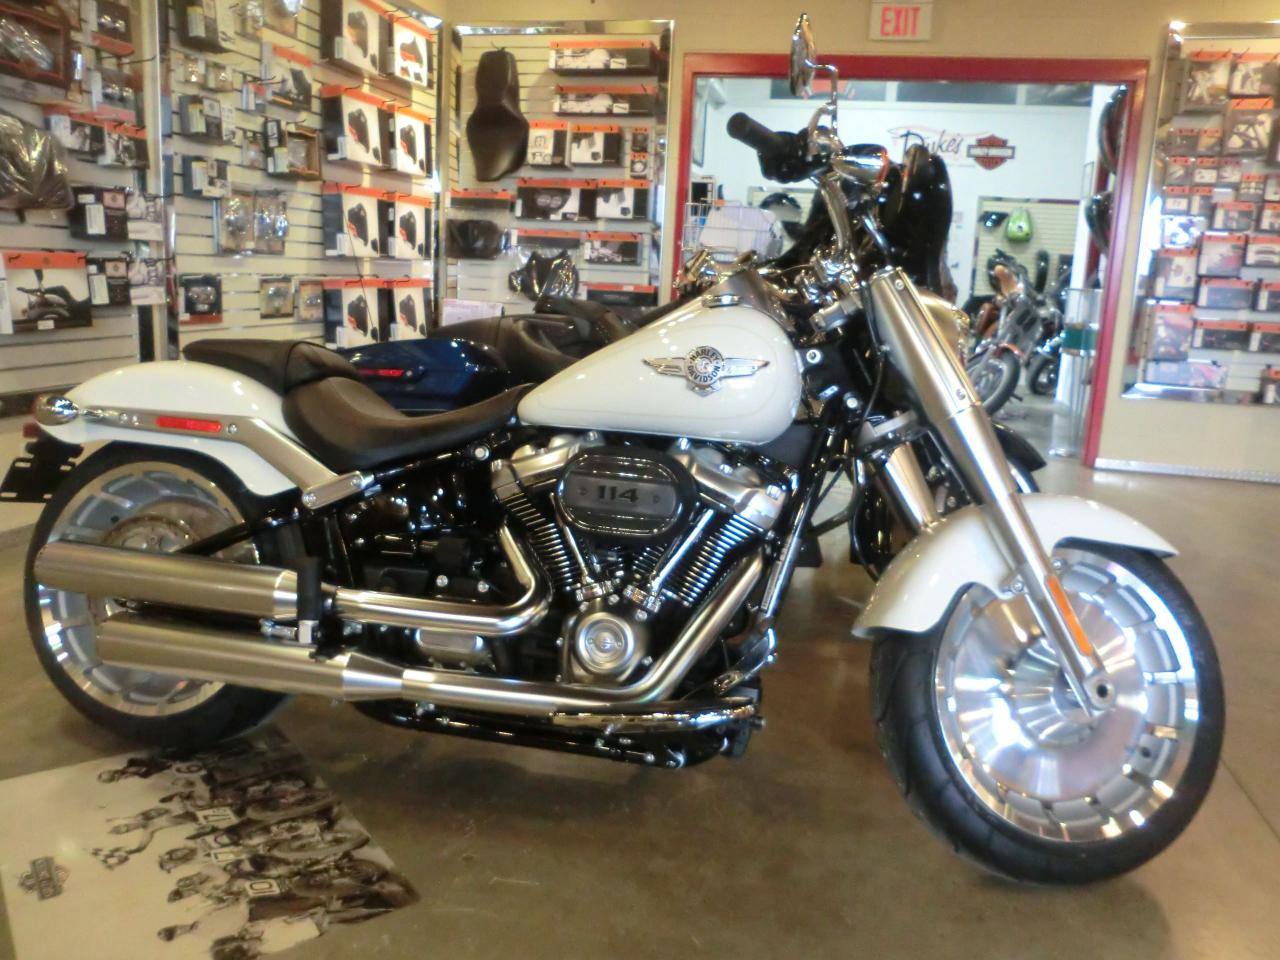 2018 Harley-Davidson FAT BOY FLFBS 114